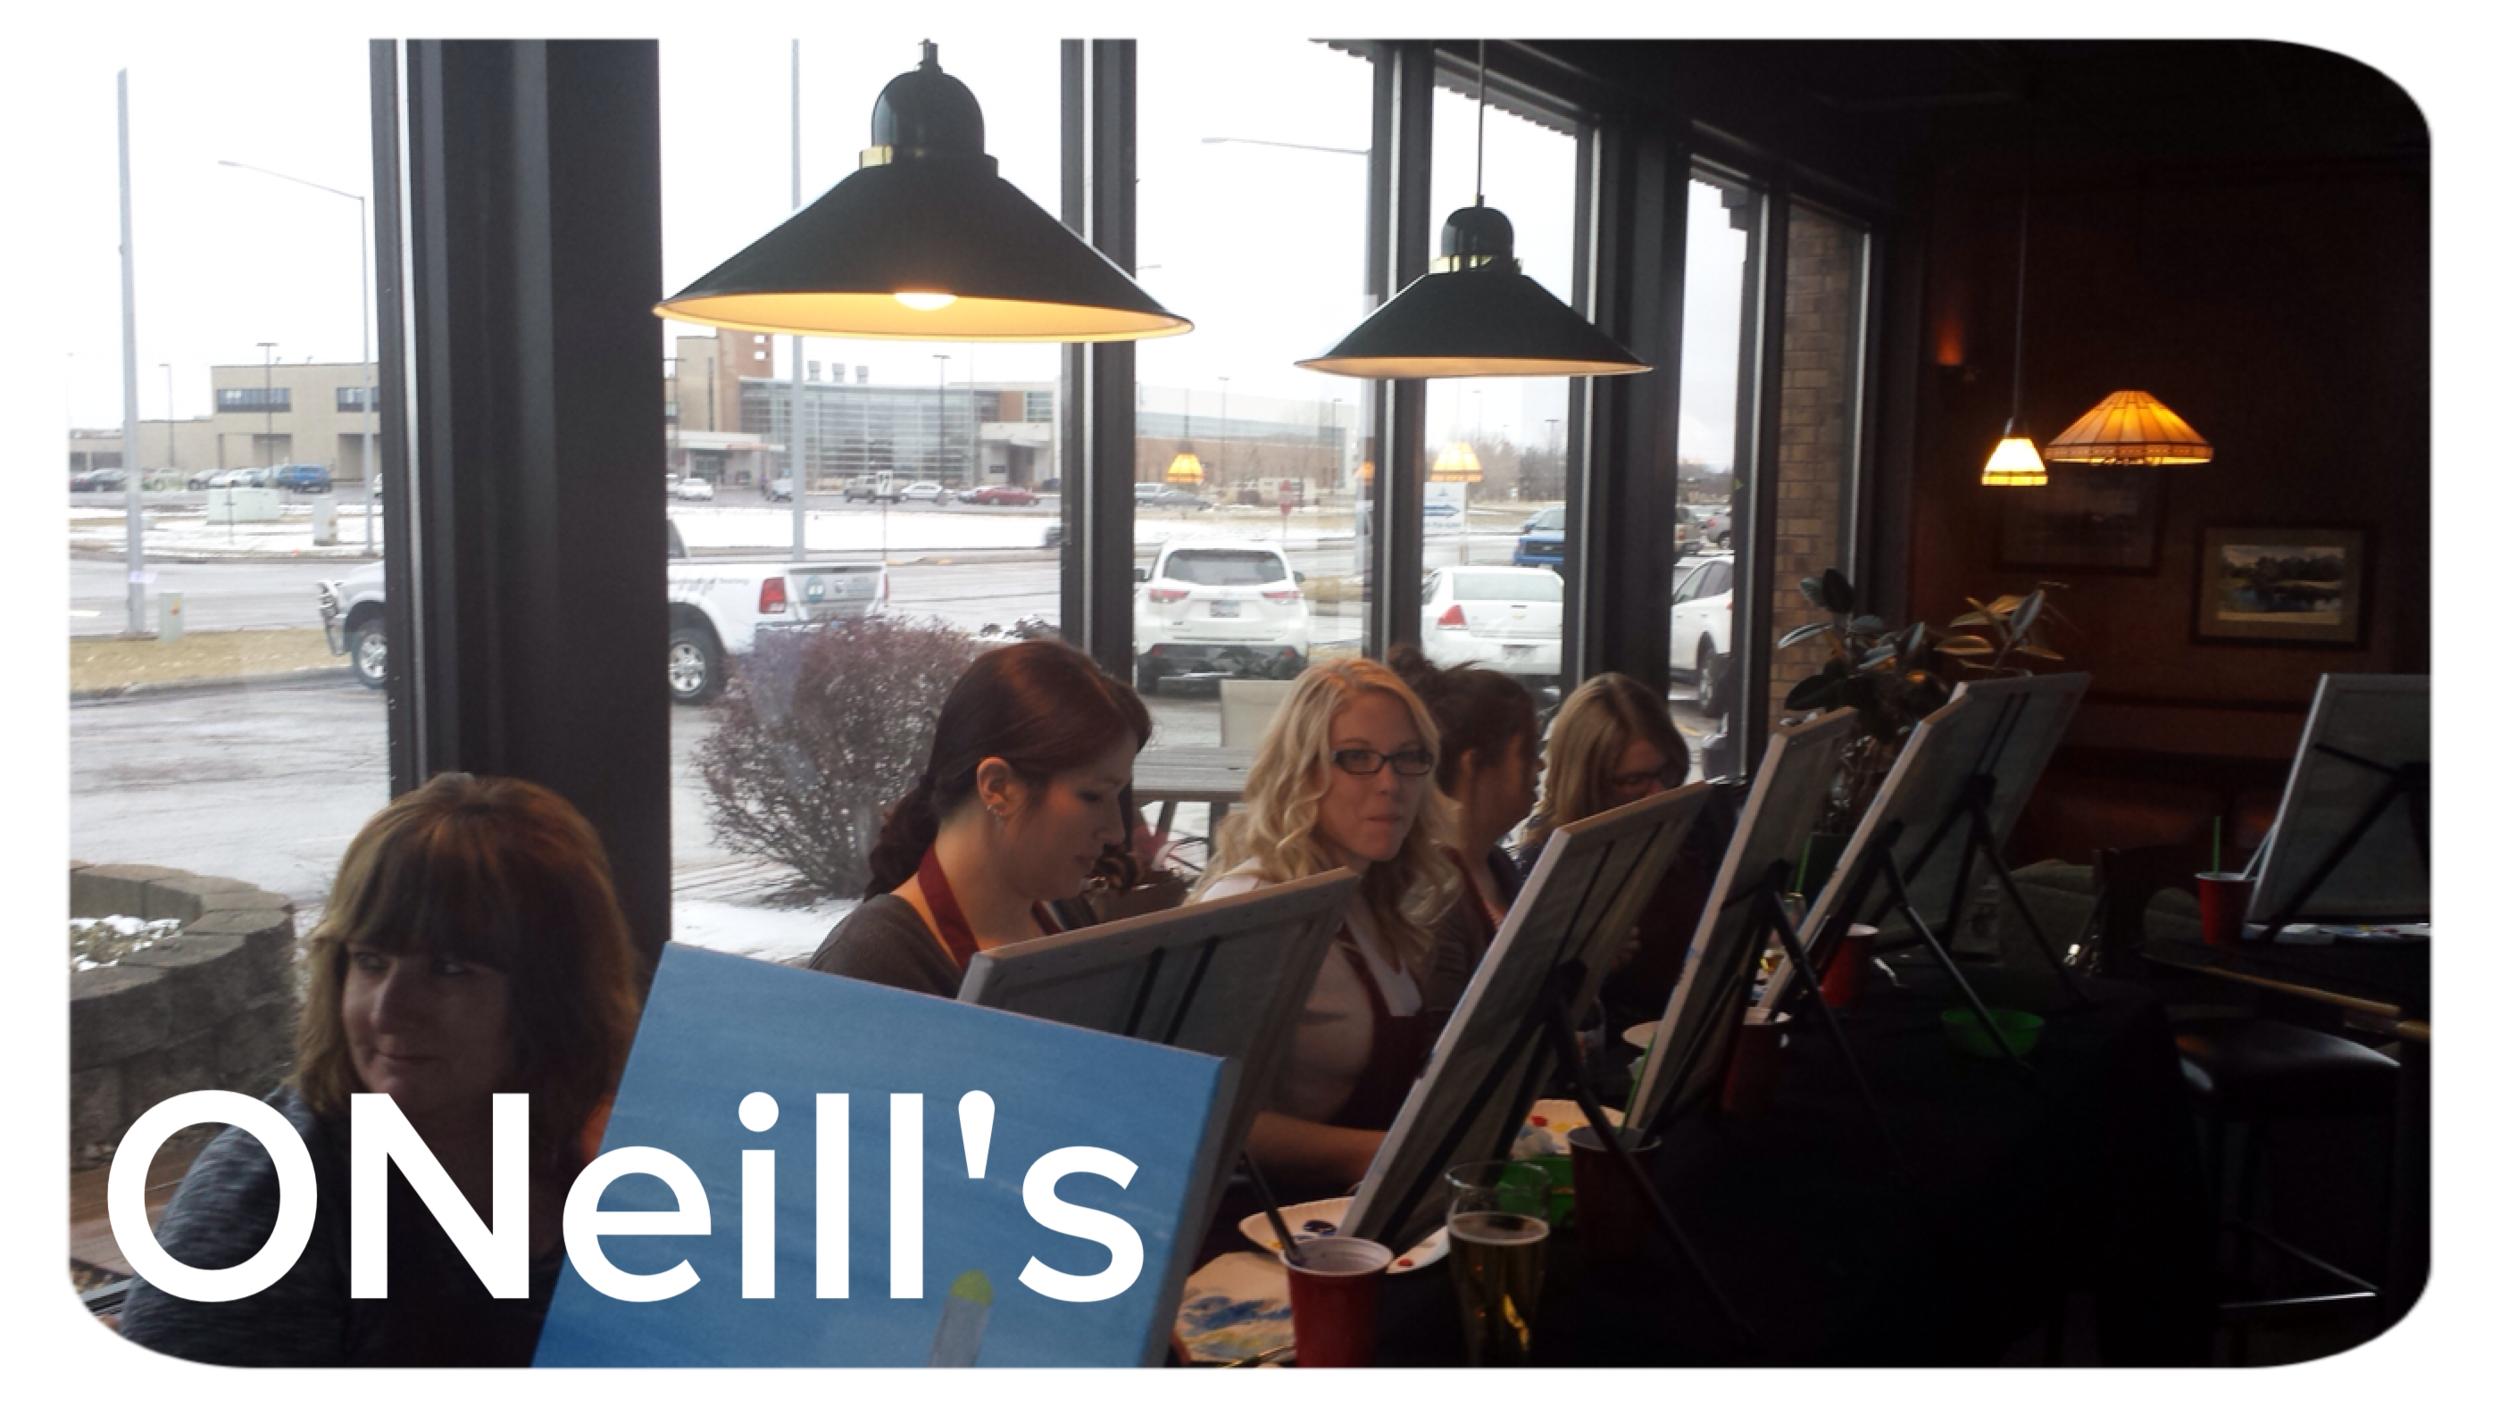 O'Neill's